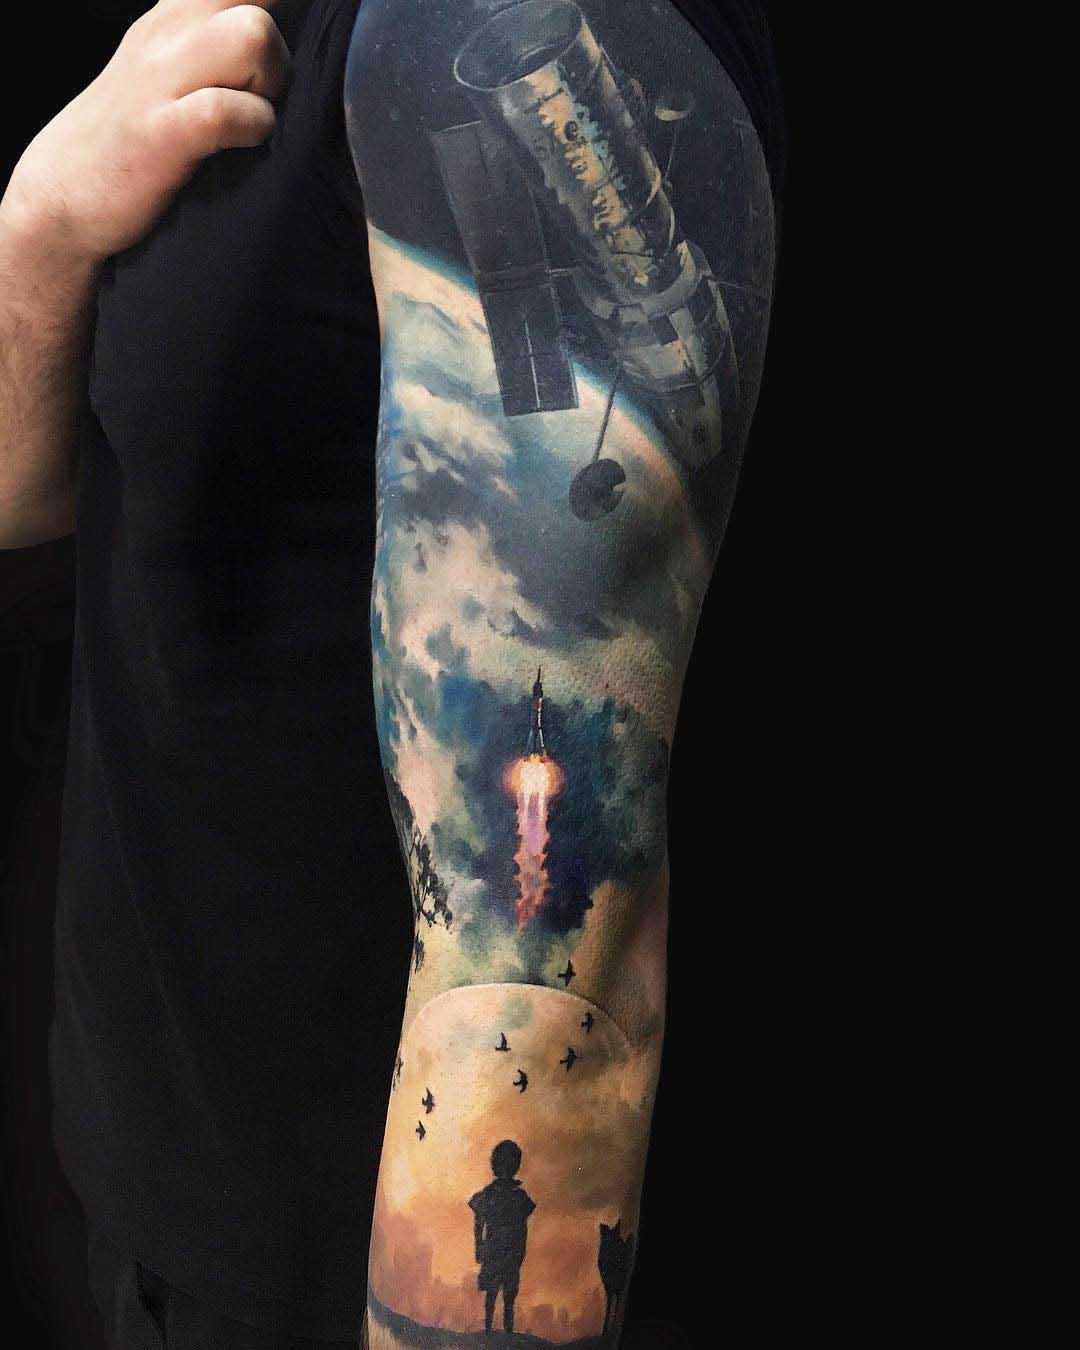 space hubble telescope tattoo sleeve